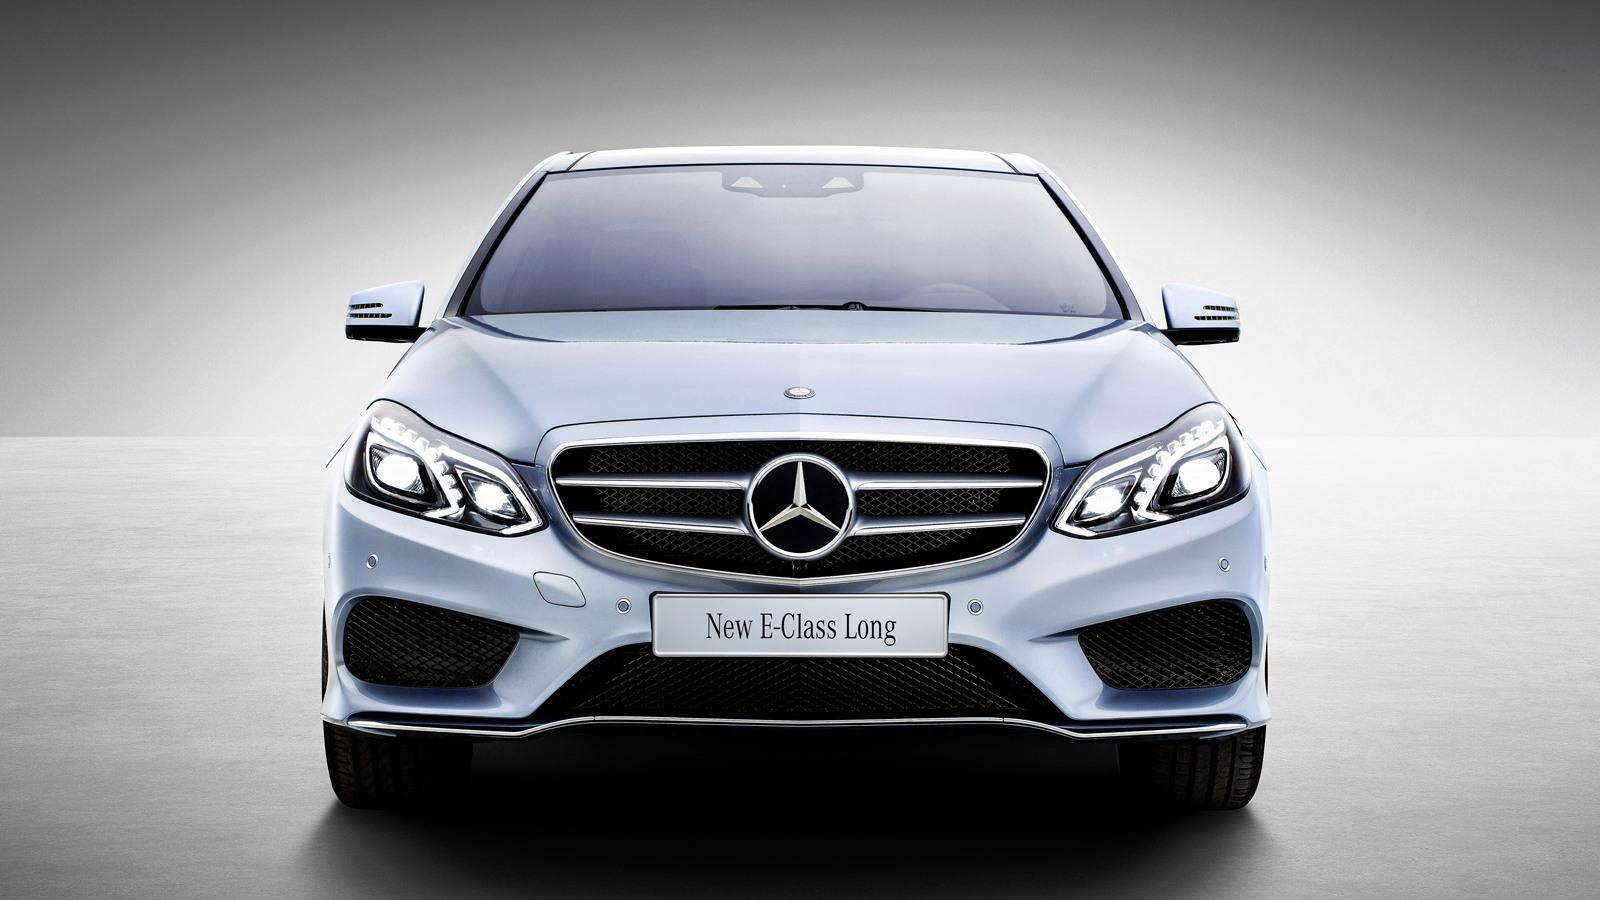 2014 Mercedes-Benz E Class L